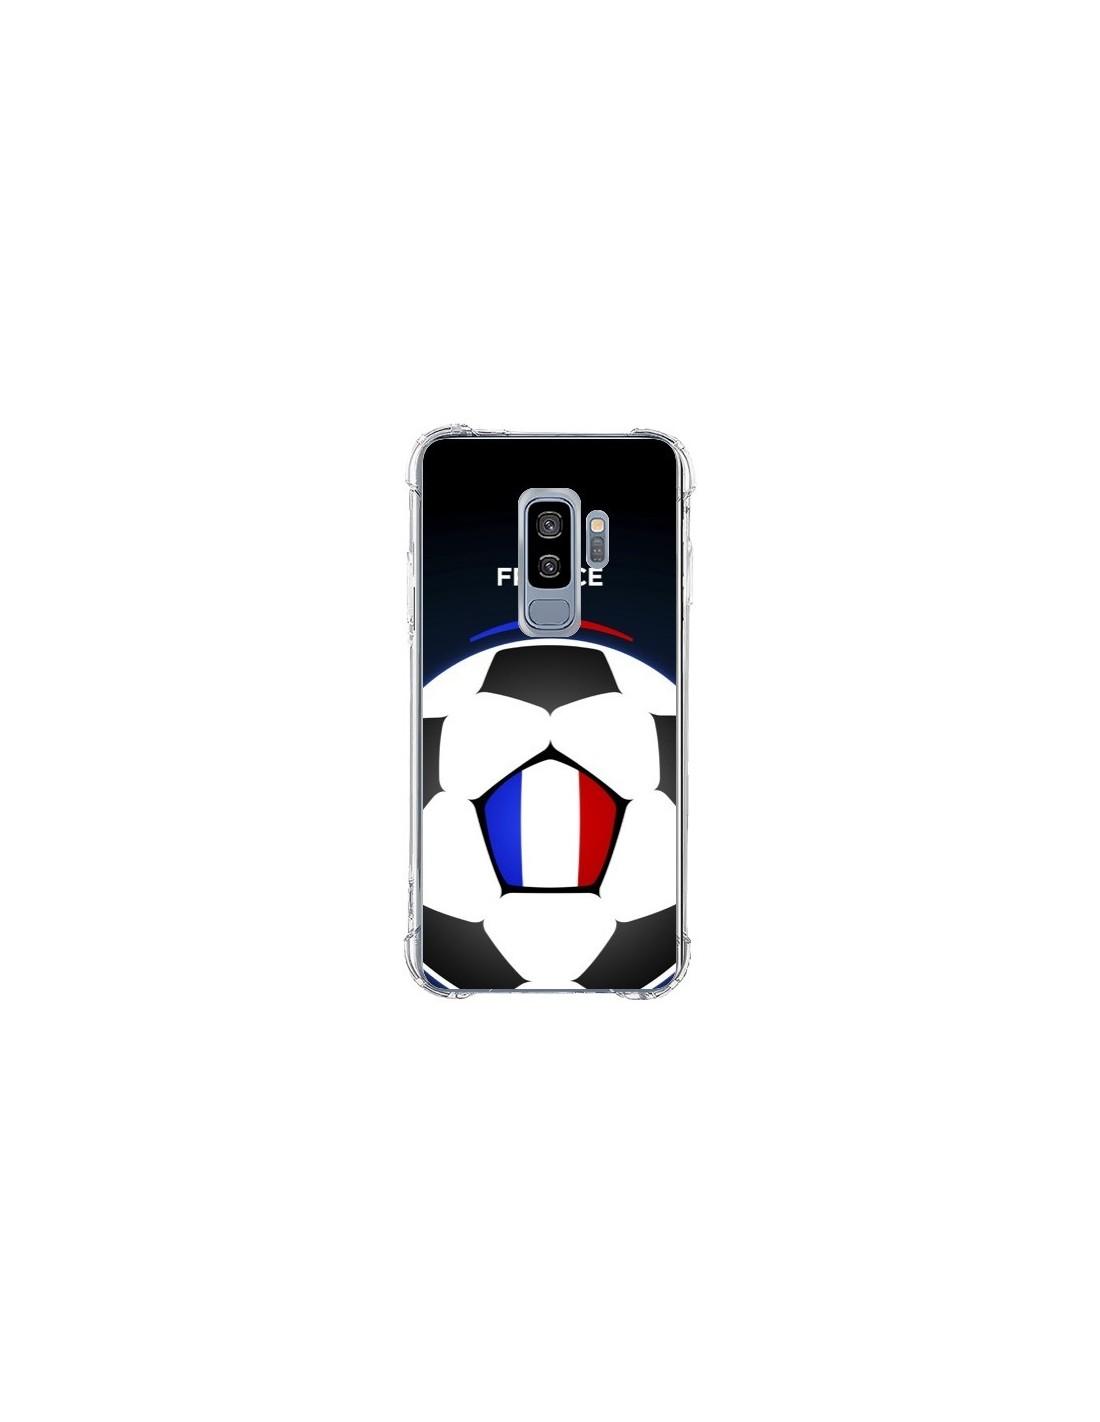 Coque Samsung S9 Plus France Ballon Football - Madotta